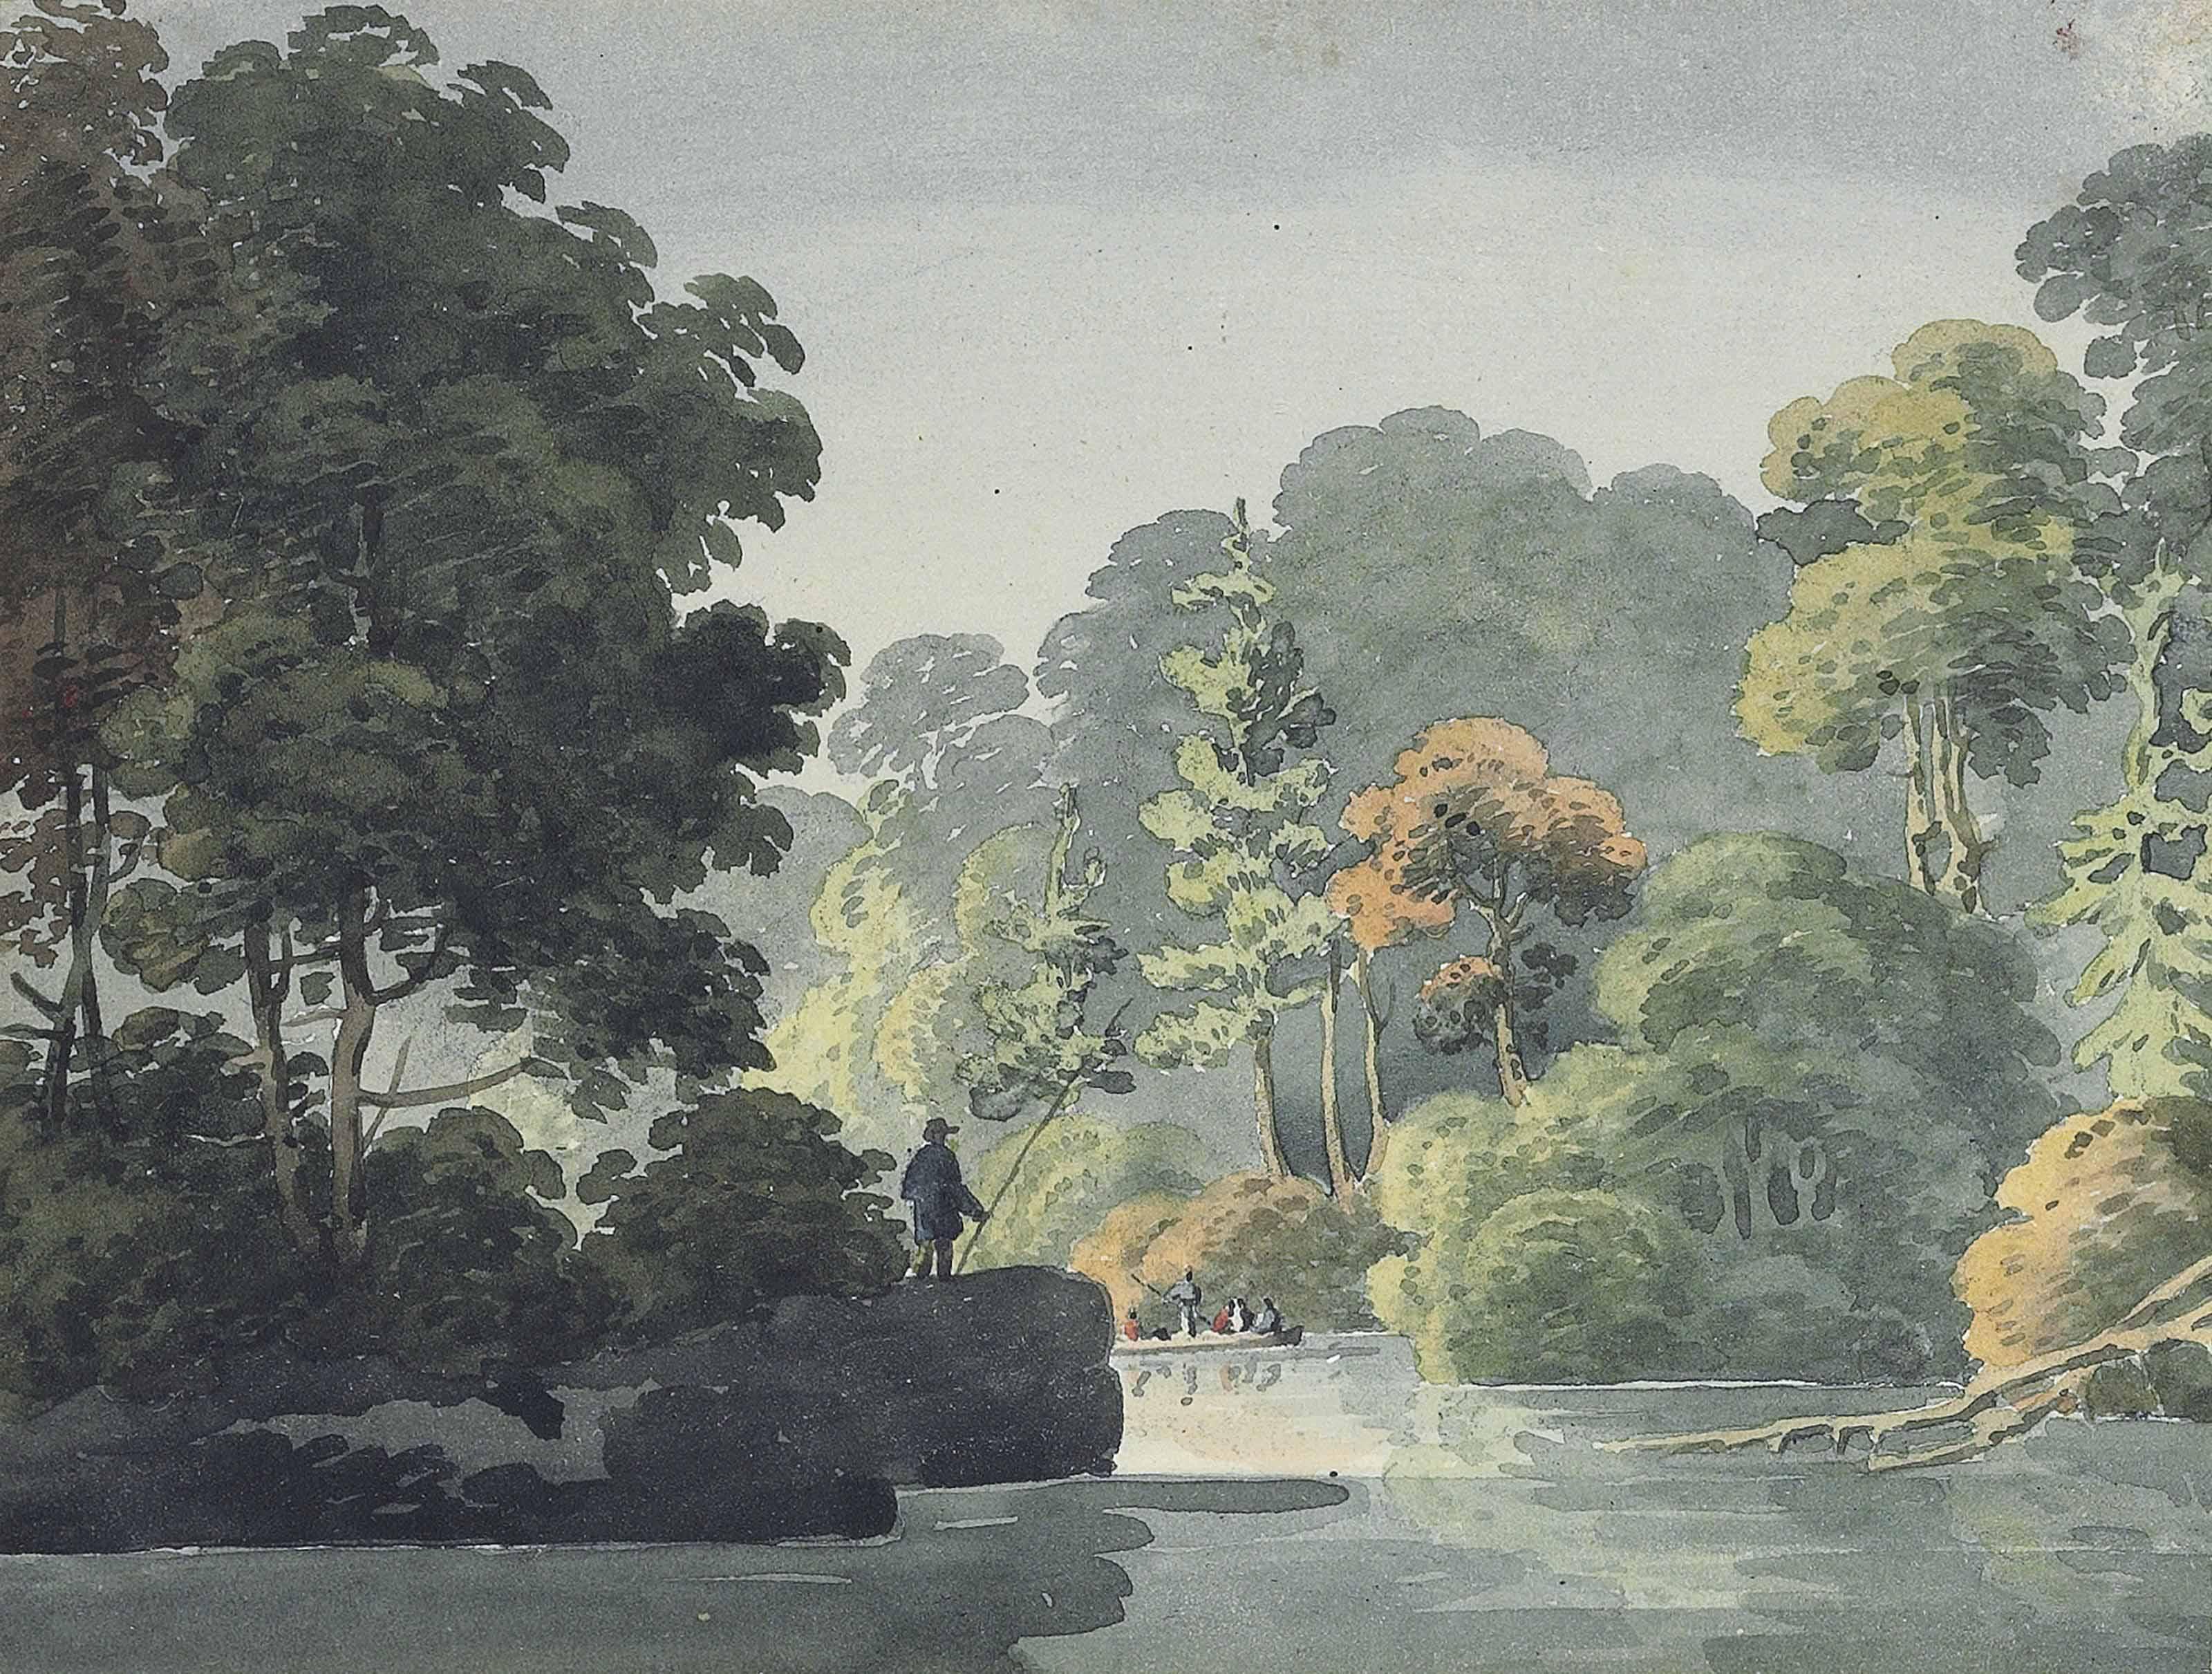 River St Charles, 1810